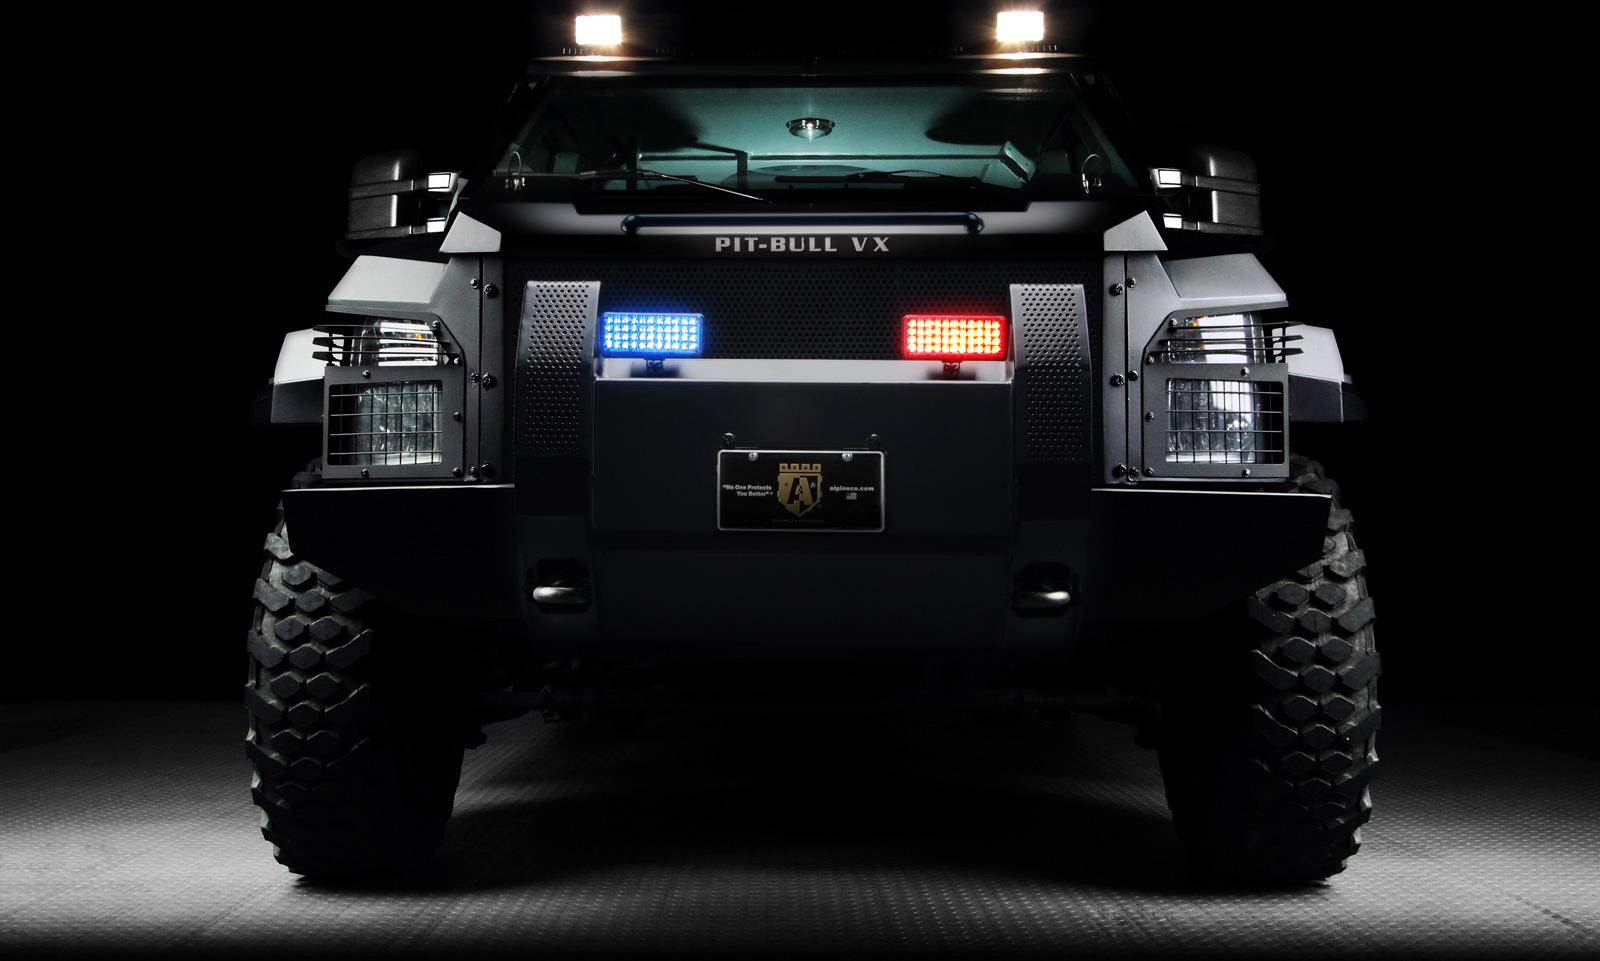 Swat Background 1600x961